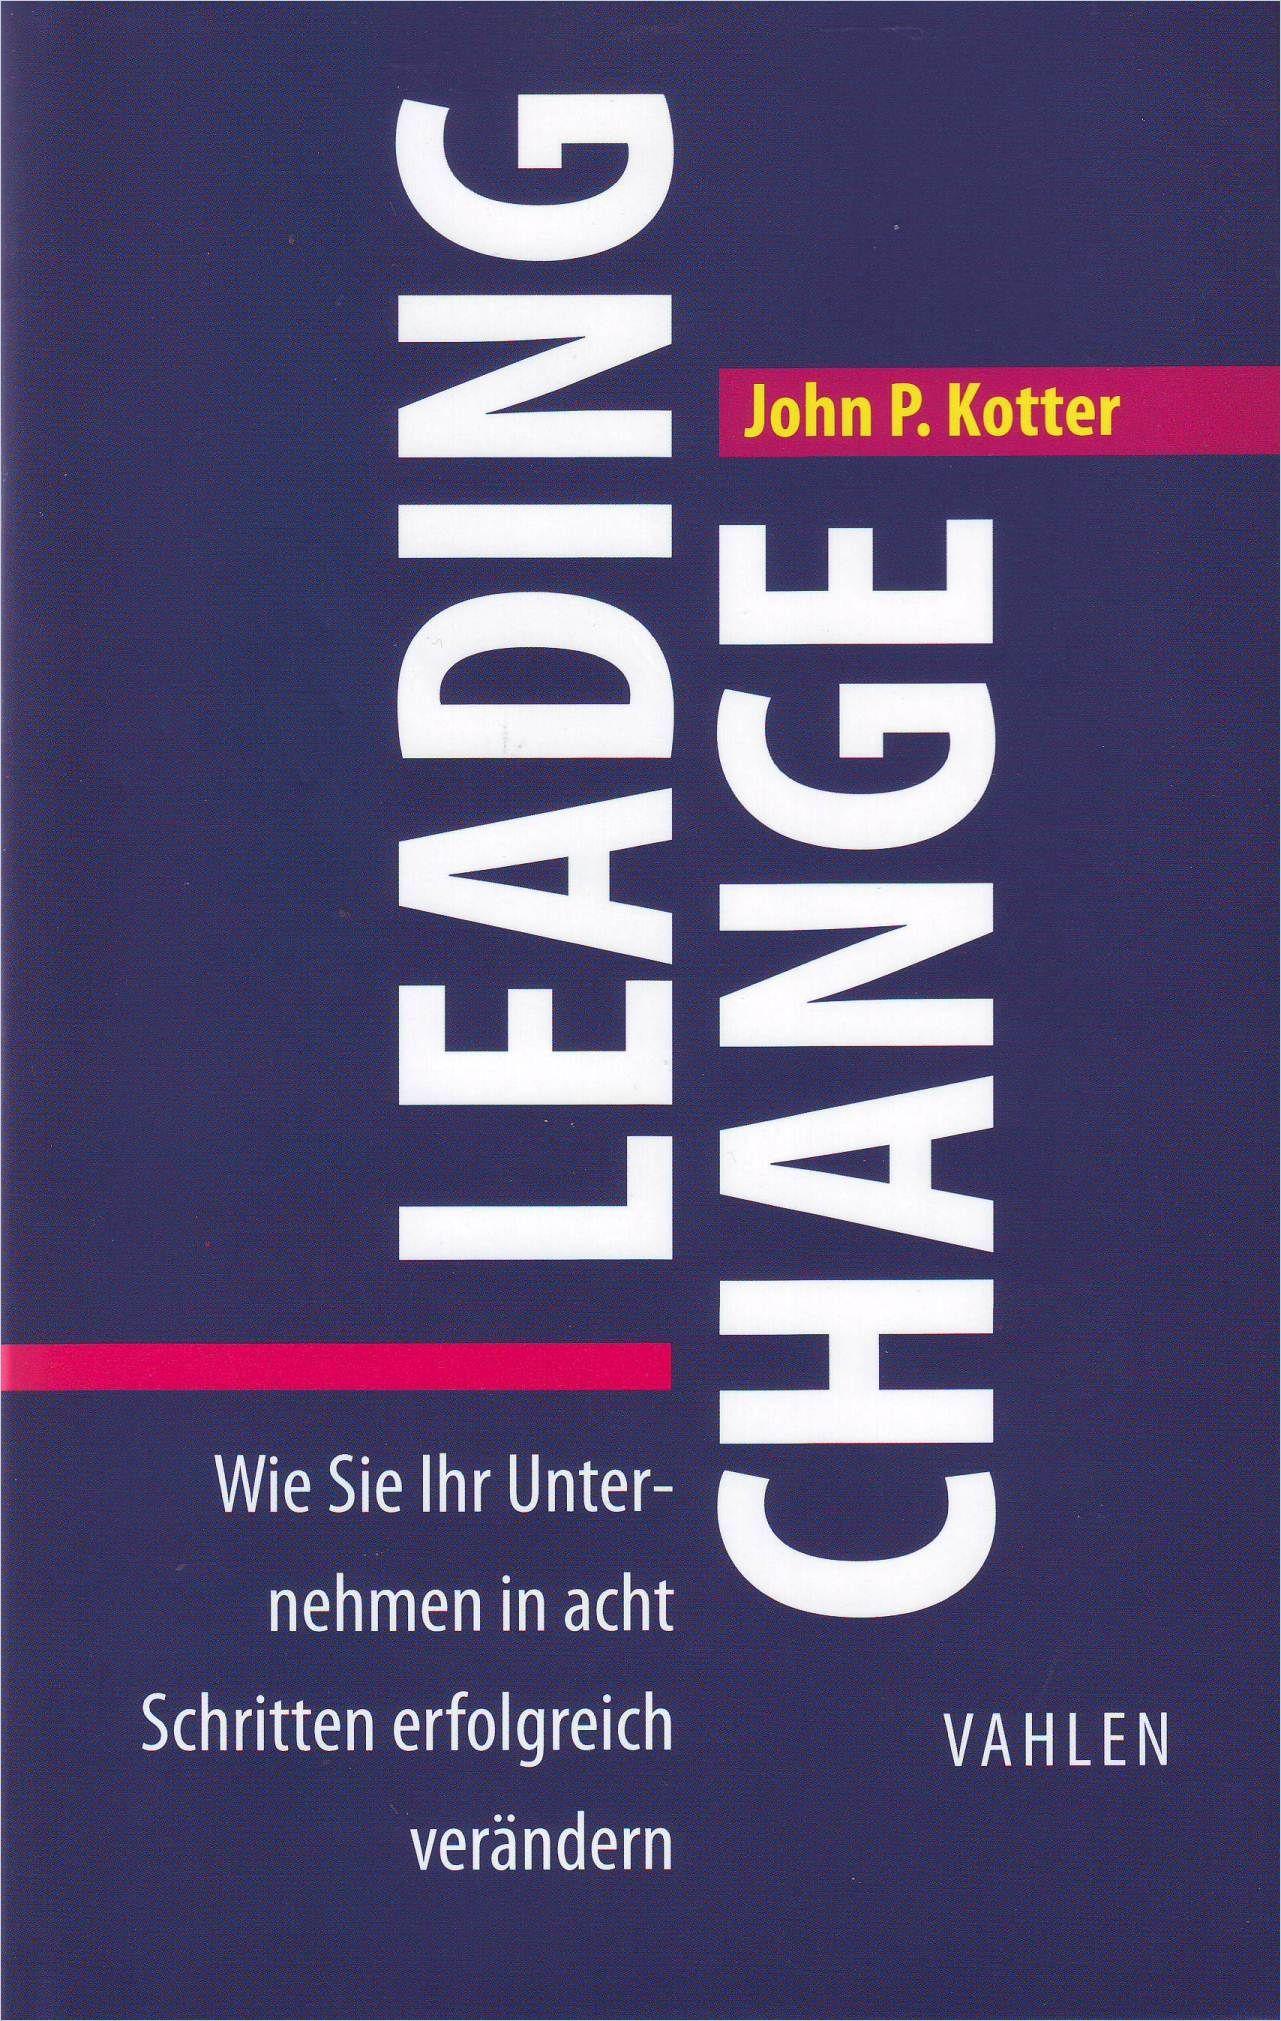 Image of: Leading Change